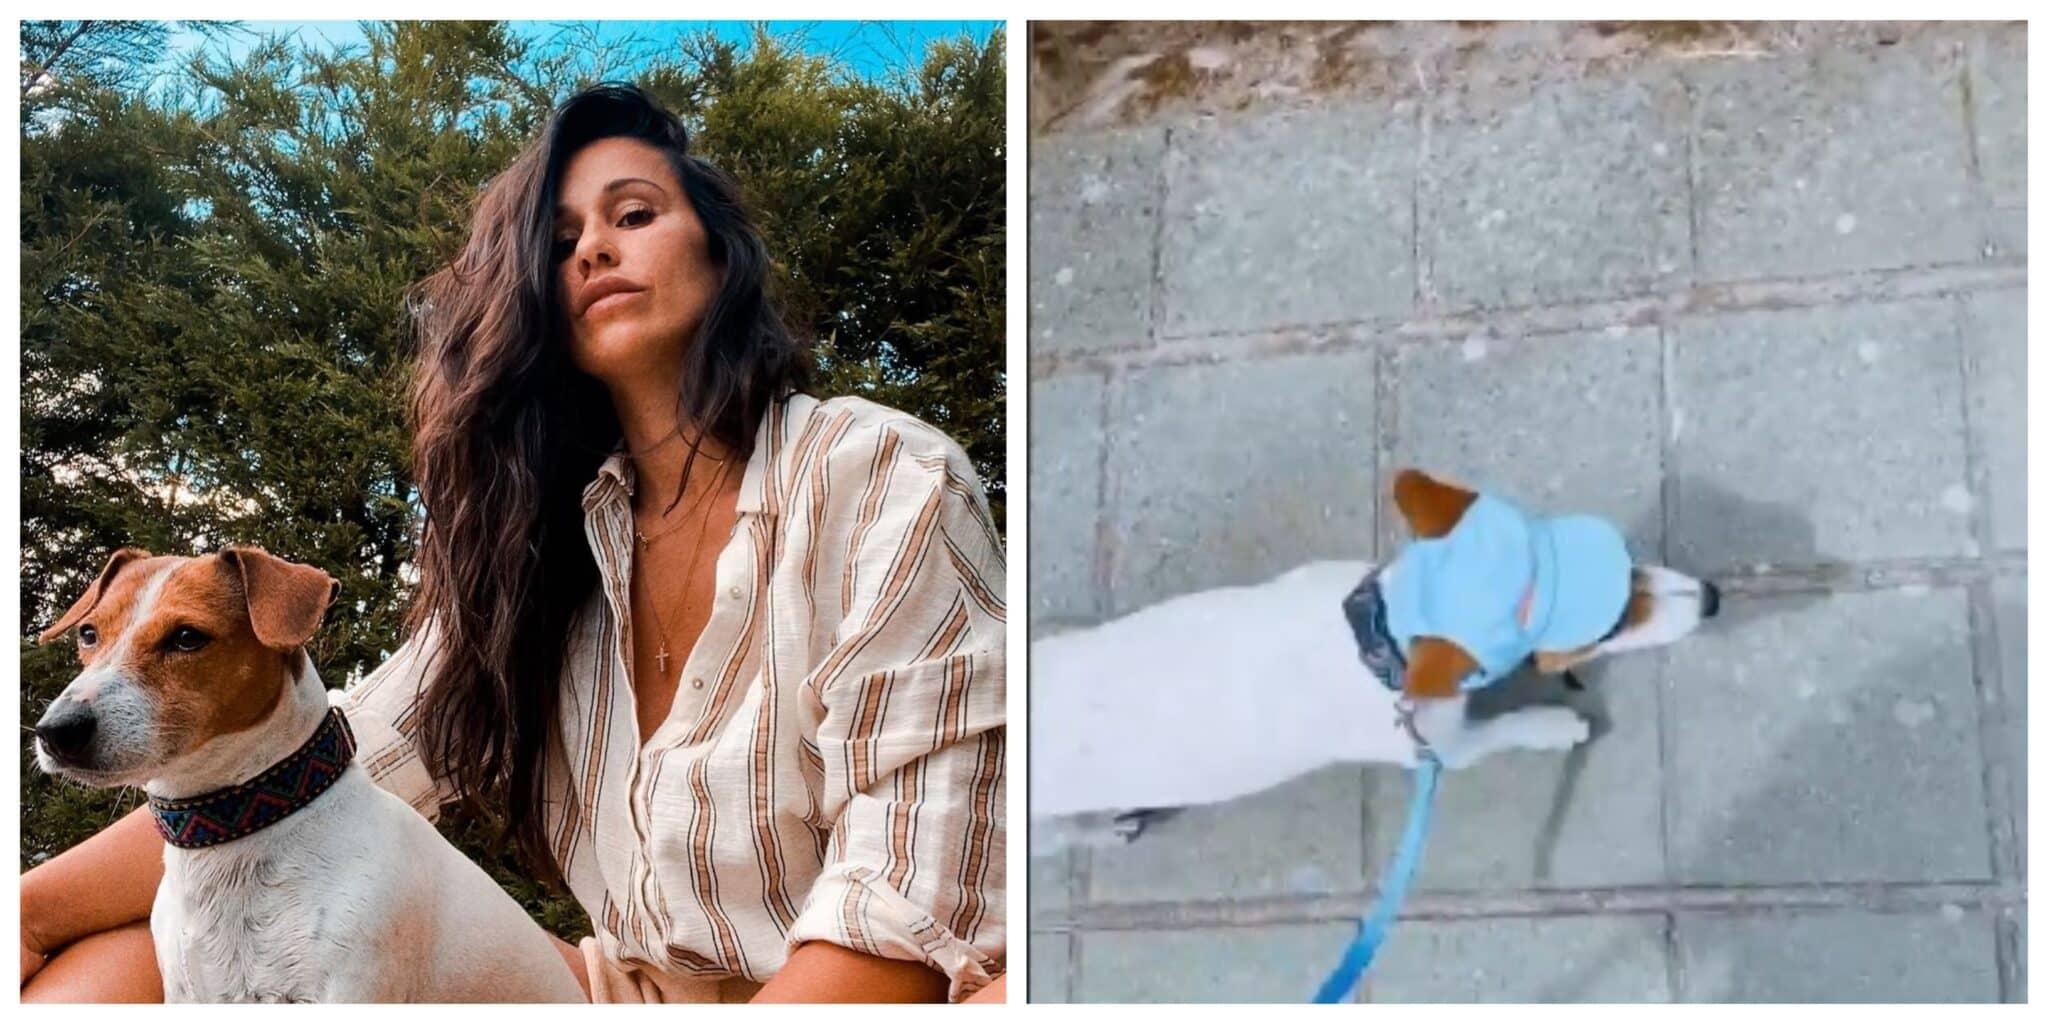 Rita-Pereira-cadela-Heyvi